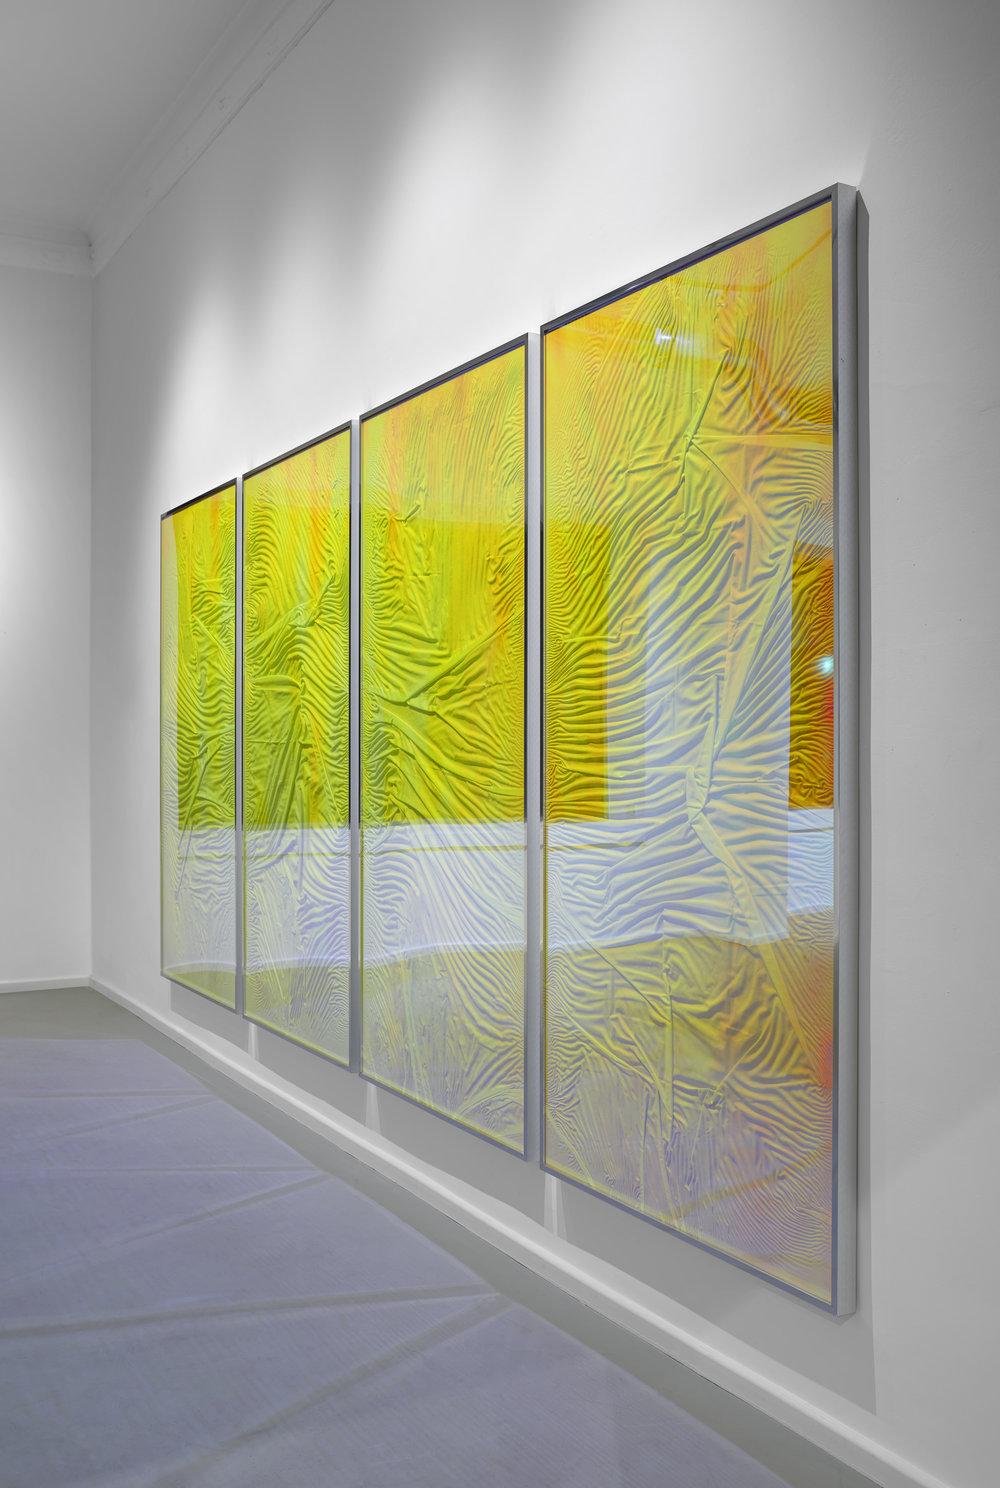 L'apparition / Part IV, V, VI, VII (Quadriptych),  2014 - Side view Linen on wood beneath Radiant Plexiglas, aluminium frame structure 400 x 200 cm (157 x 79 in)